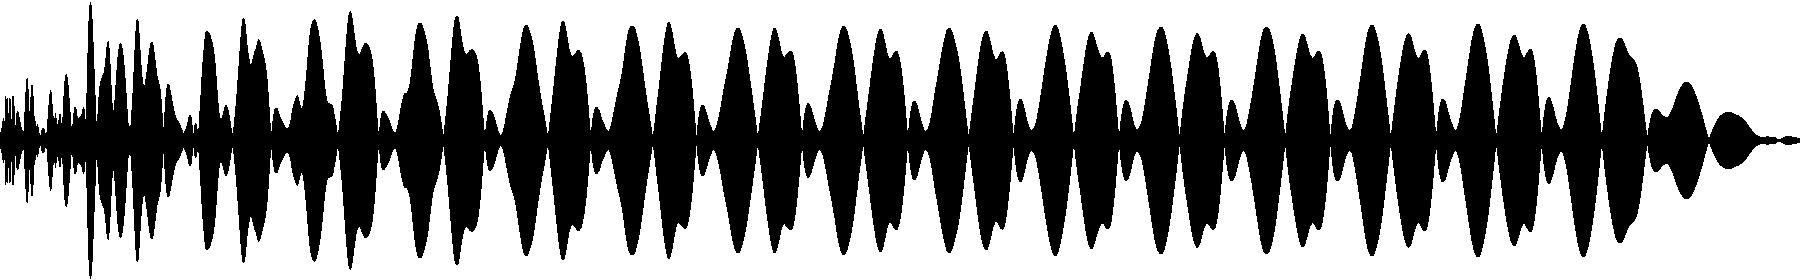 vedh bass cut 041 g